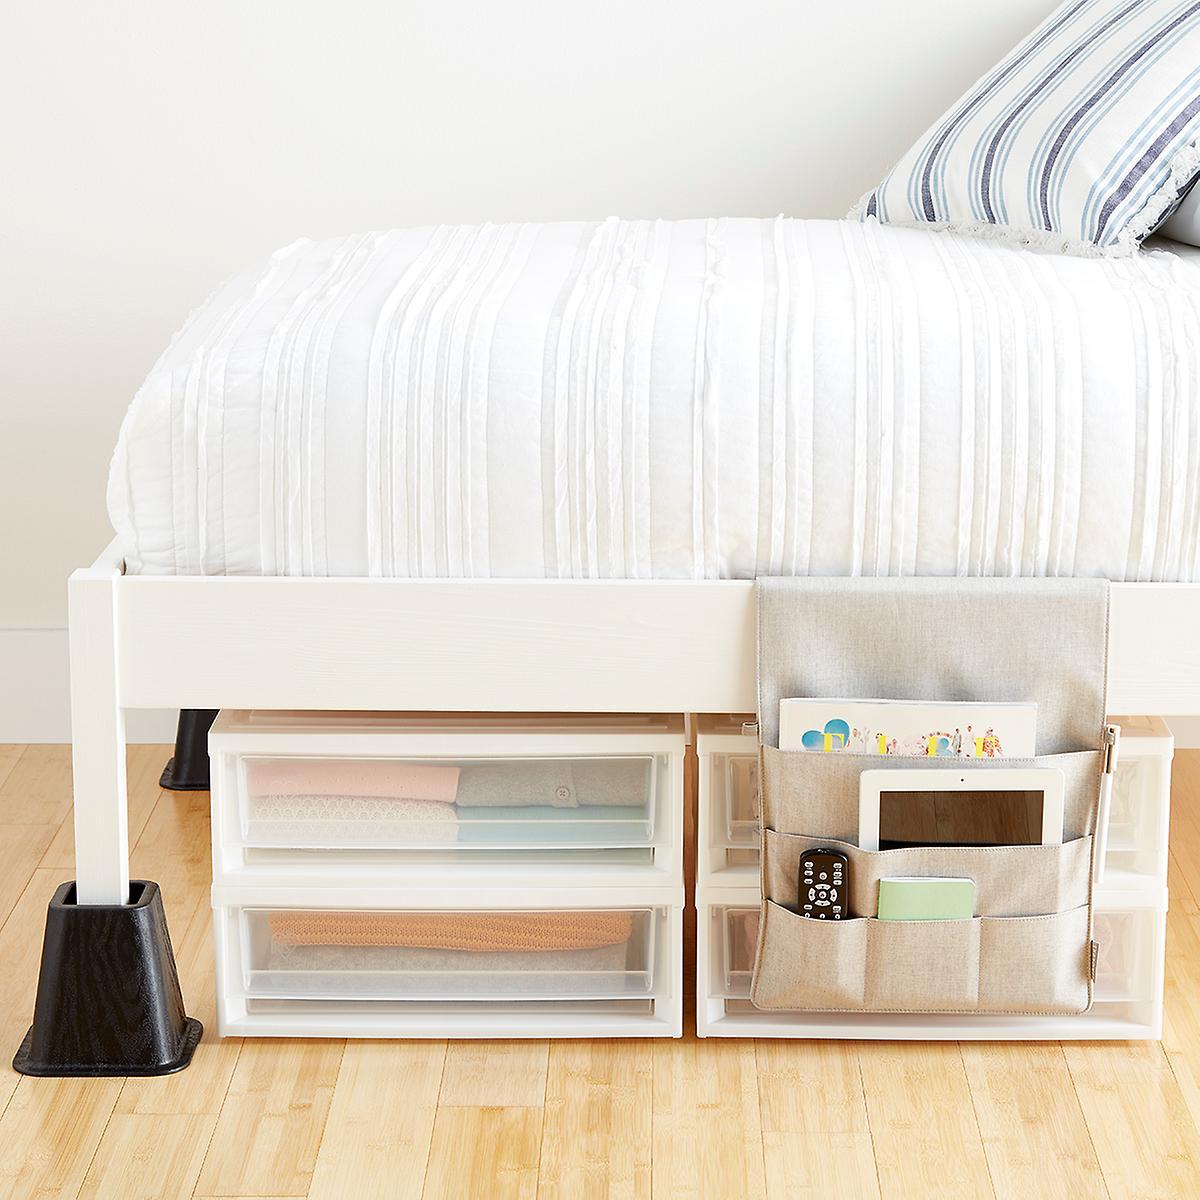 College Bed & Under the Bed Starter Kit